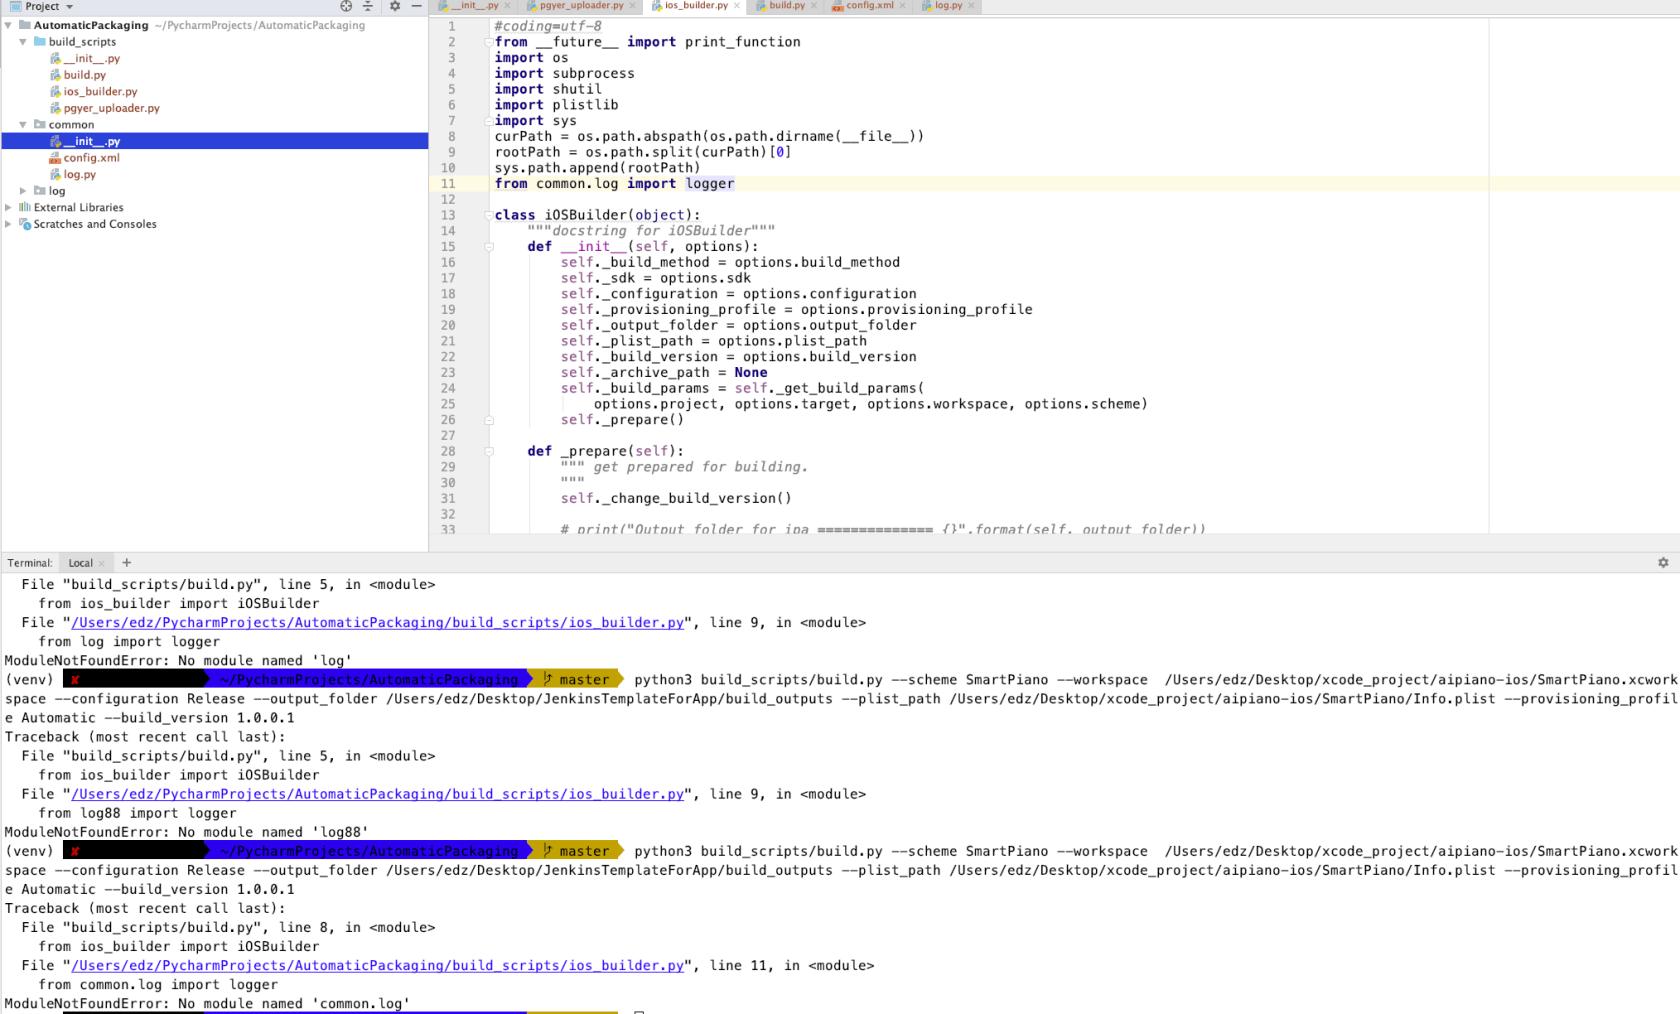 python3 命令行执行脚本时一直报错:ModuleNotFoundError